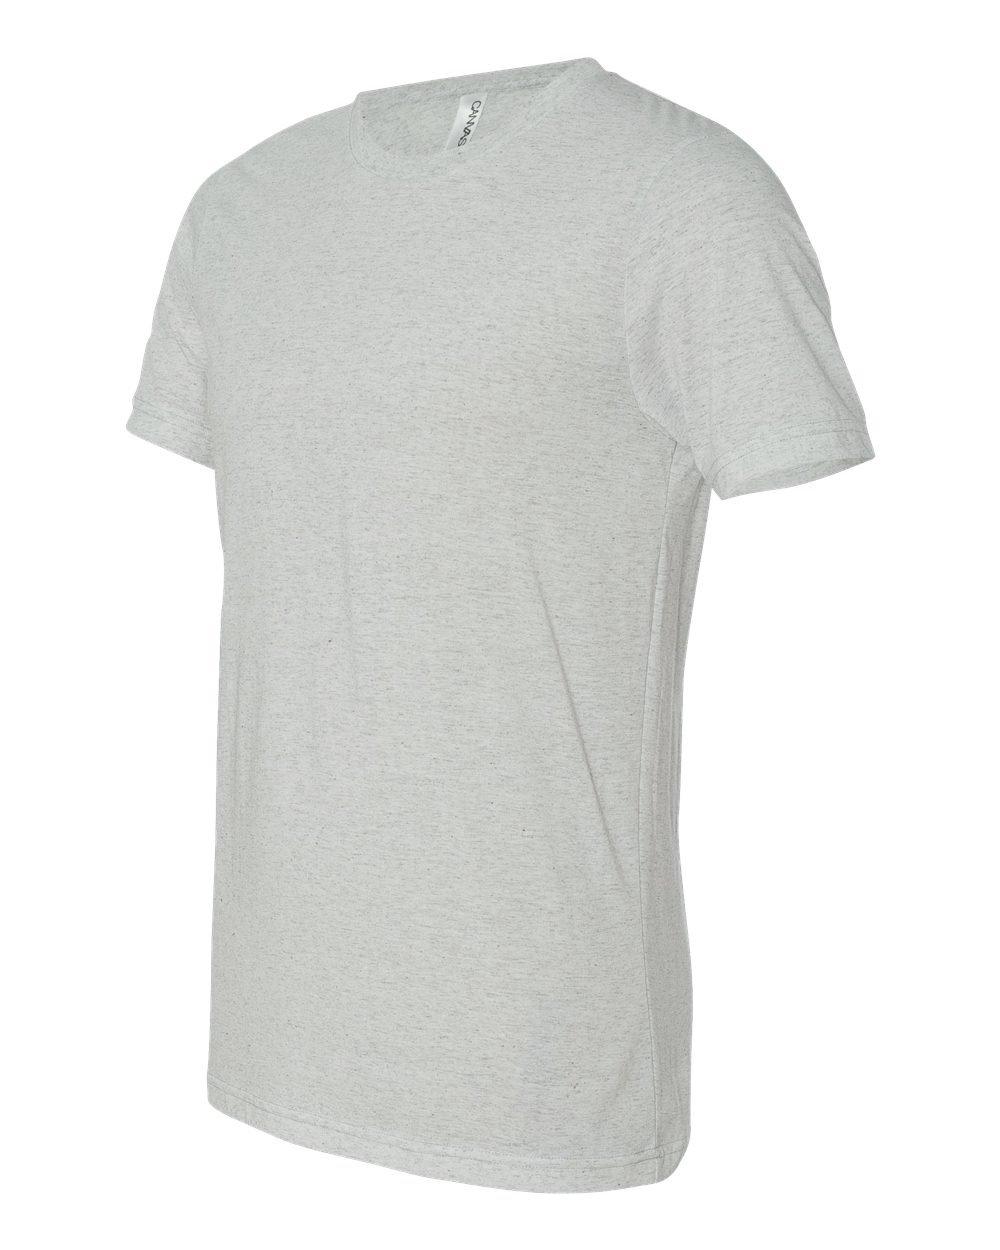 Bella And Canvas Triblend Short Sleeve T Shirt Evan